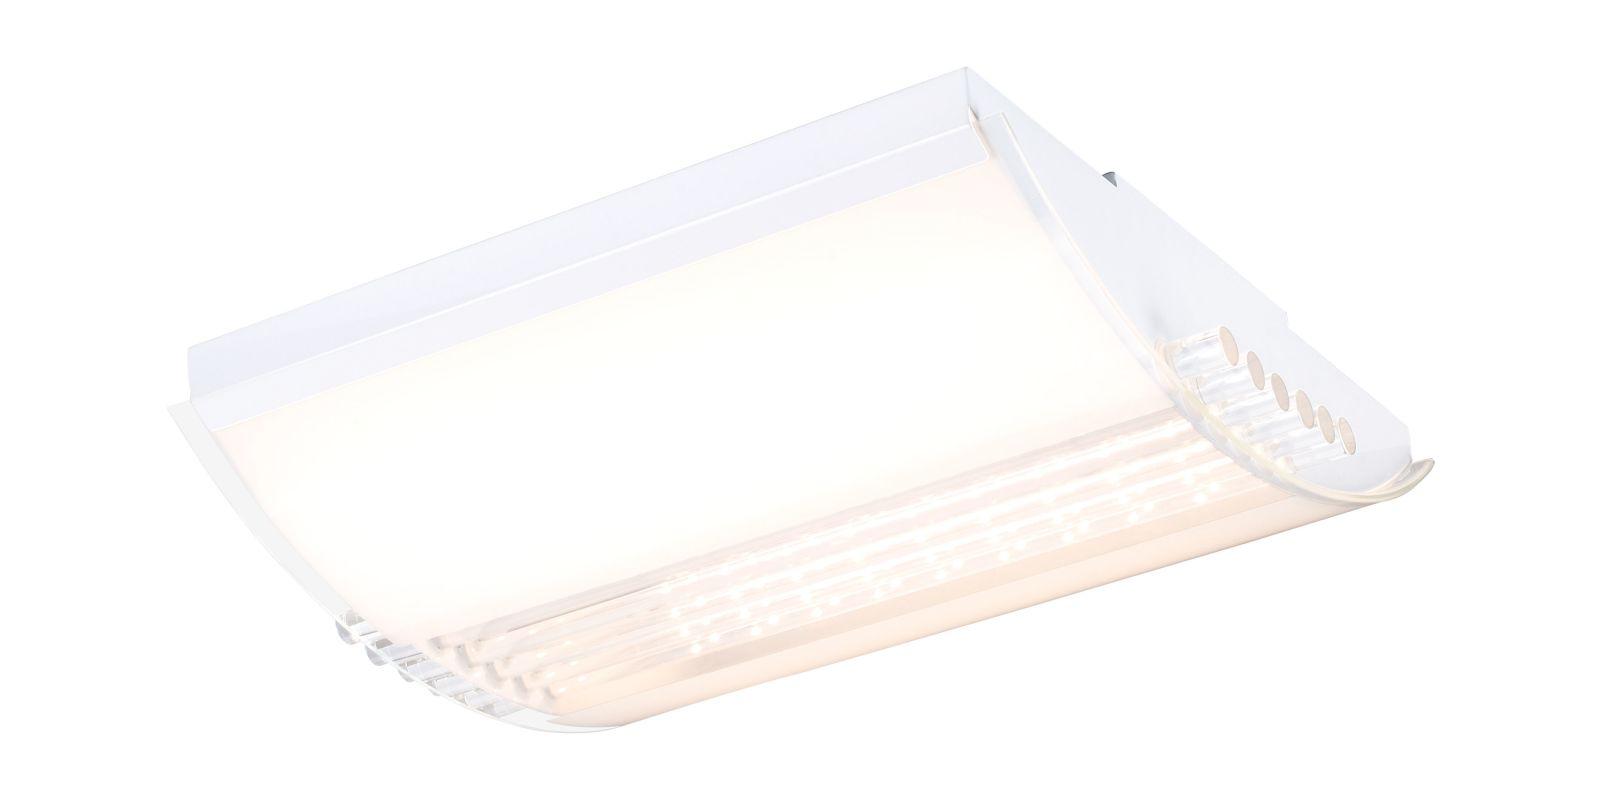 Eglo 93017 Grado 2 Light LED Flush Mount Ceiling Fixture White Indoor